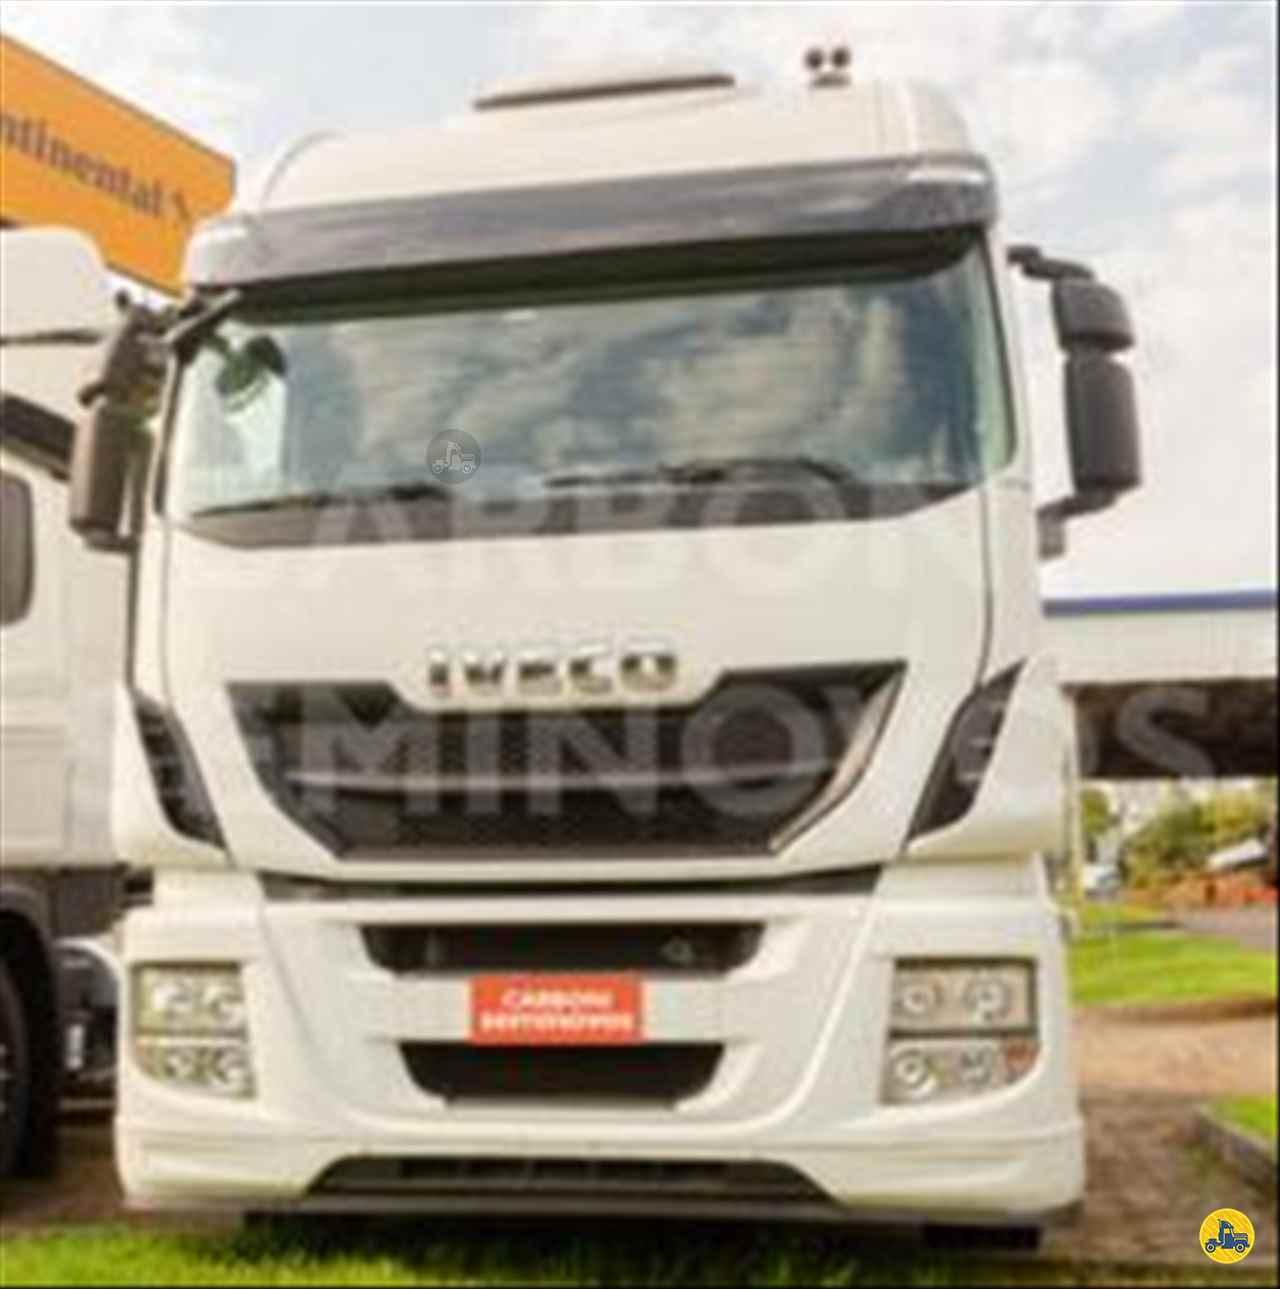 CAMINHAO IVECO STRALIS 440 Cavalo Mecânico Truck 6x2 Carboni Iveco VIDEIRA SANTA CATARINA SC